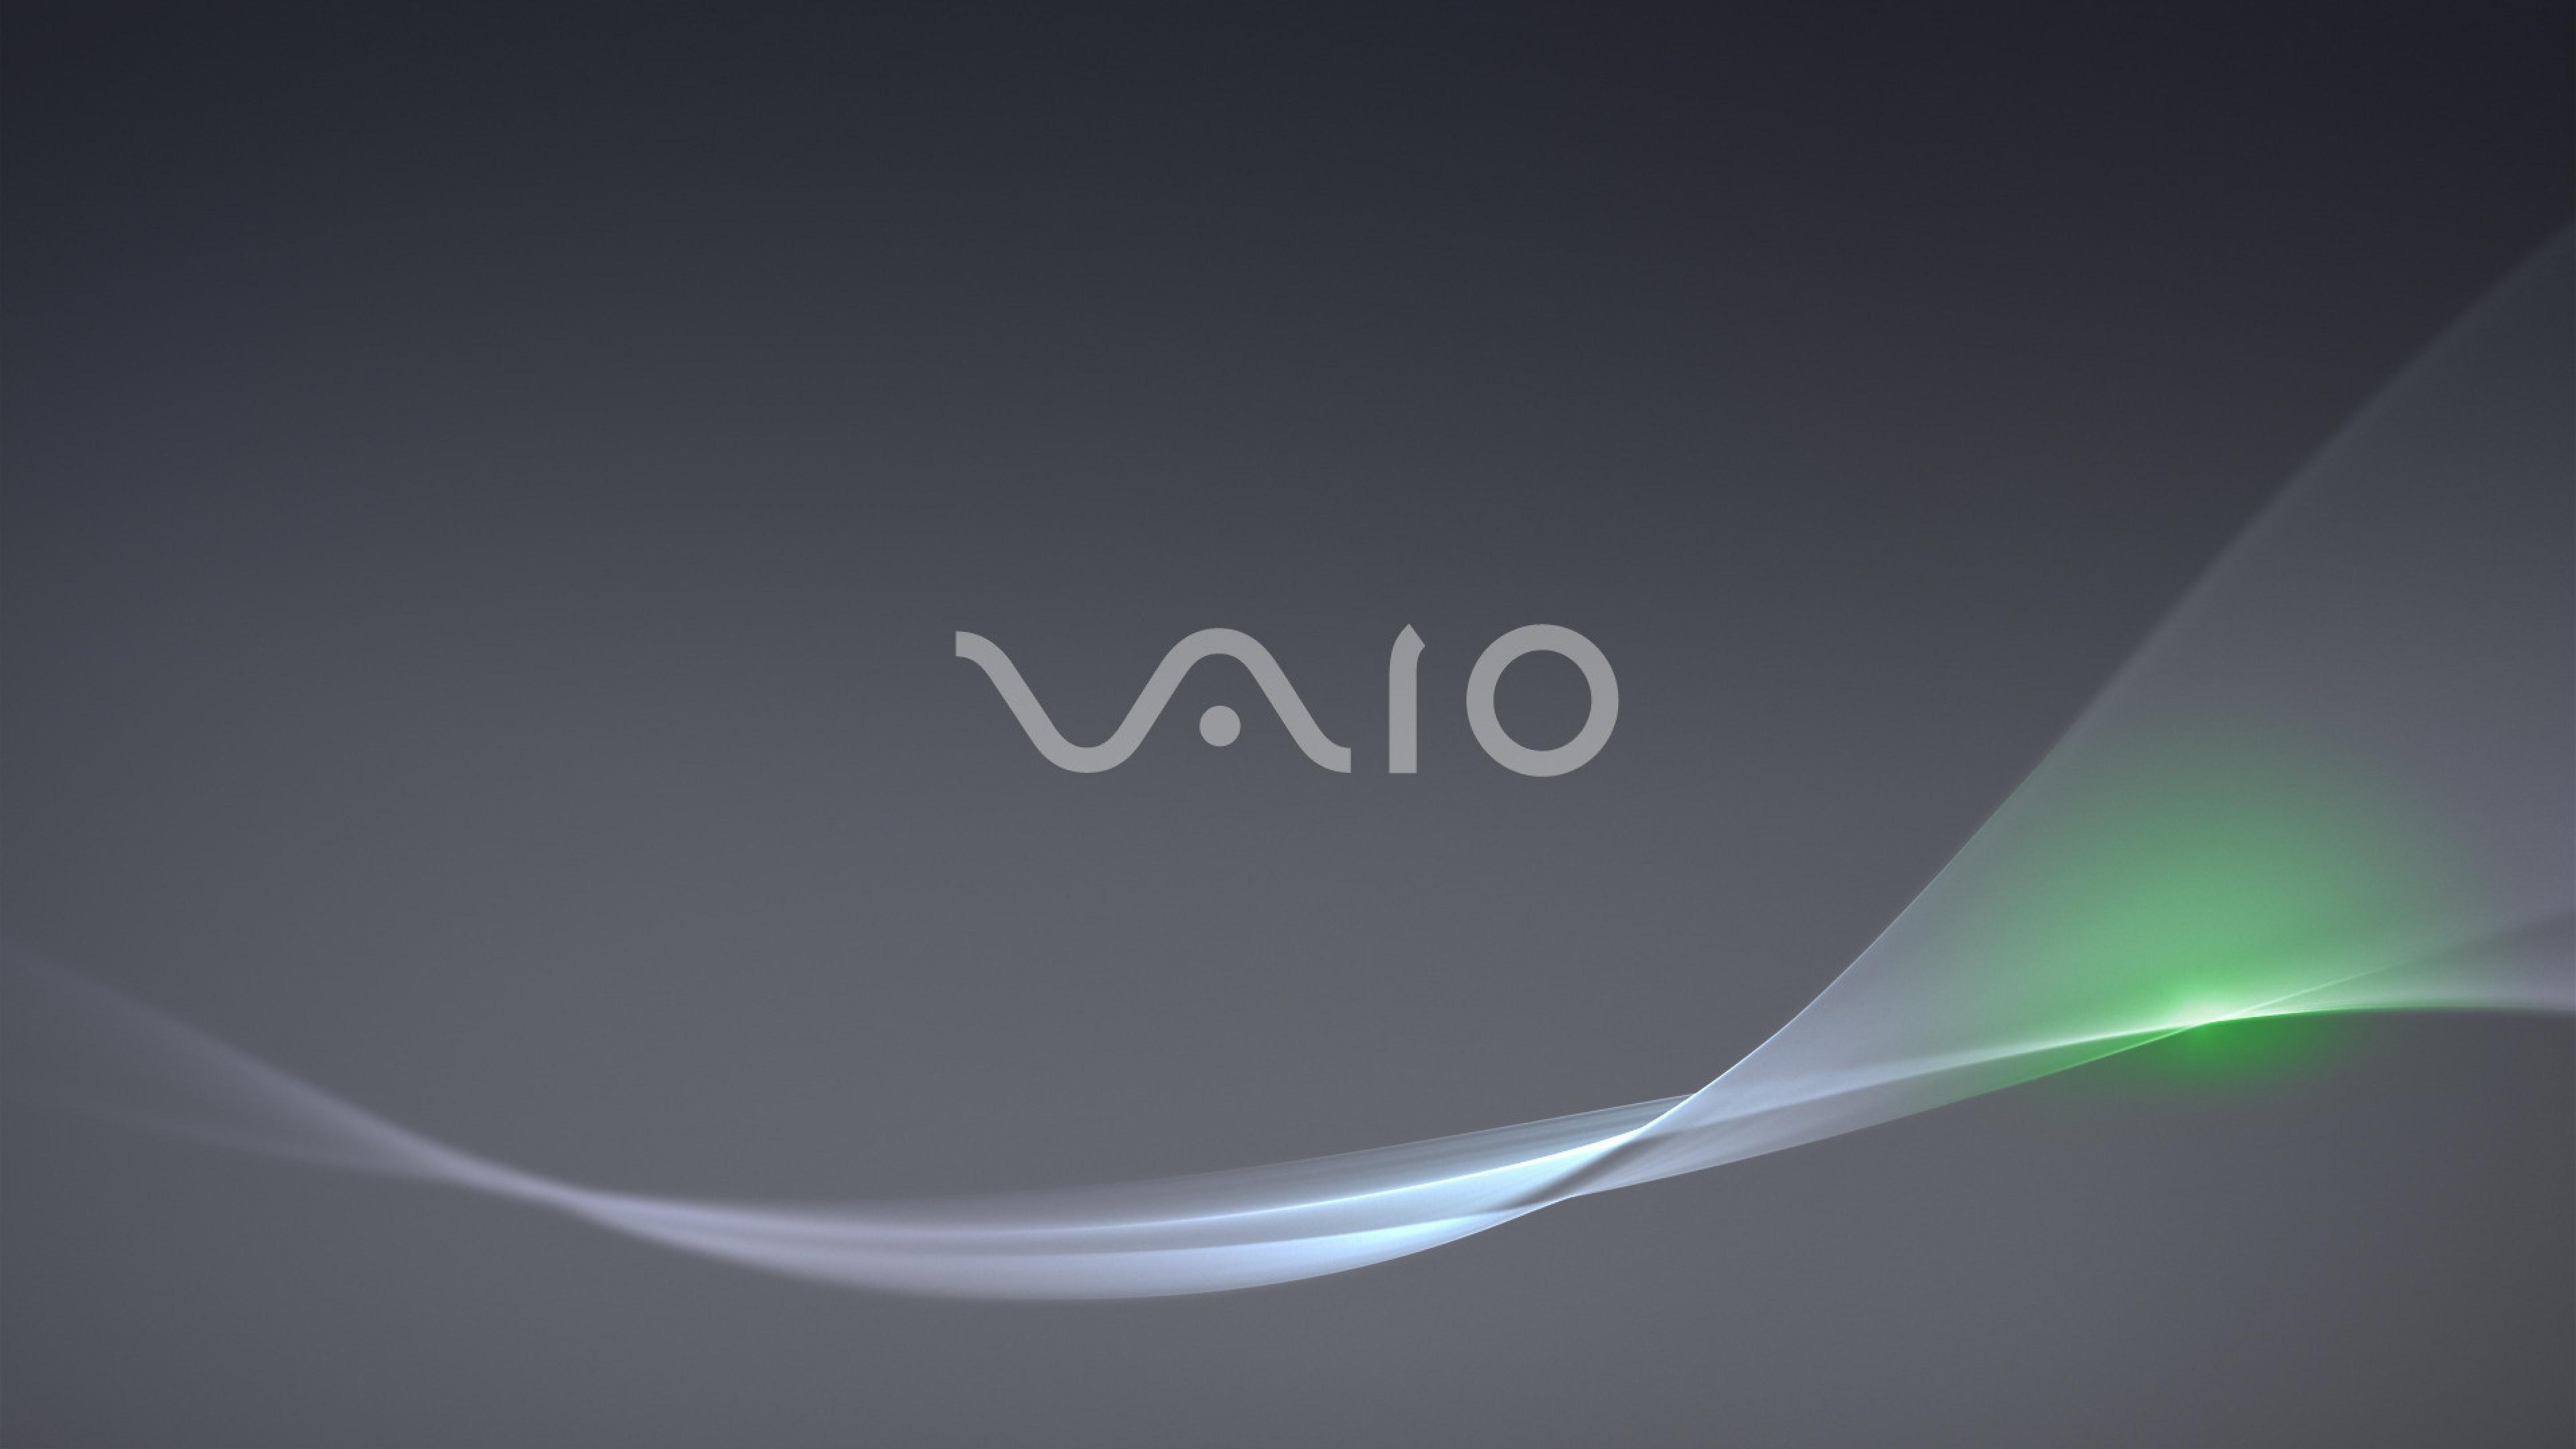 Download Wallpaper 3840x2160 vaio background hi tech logo 4K Ultra 3840x2160